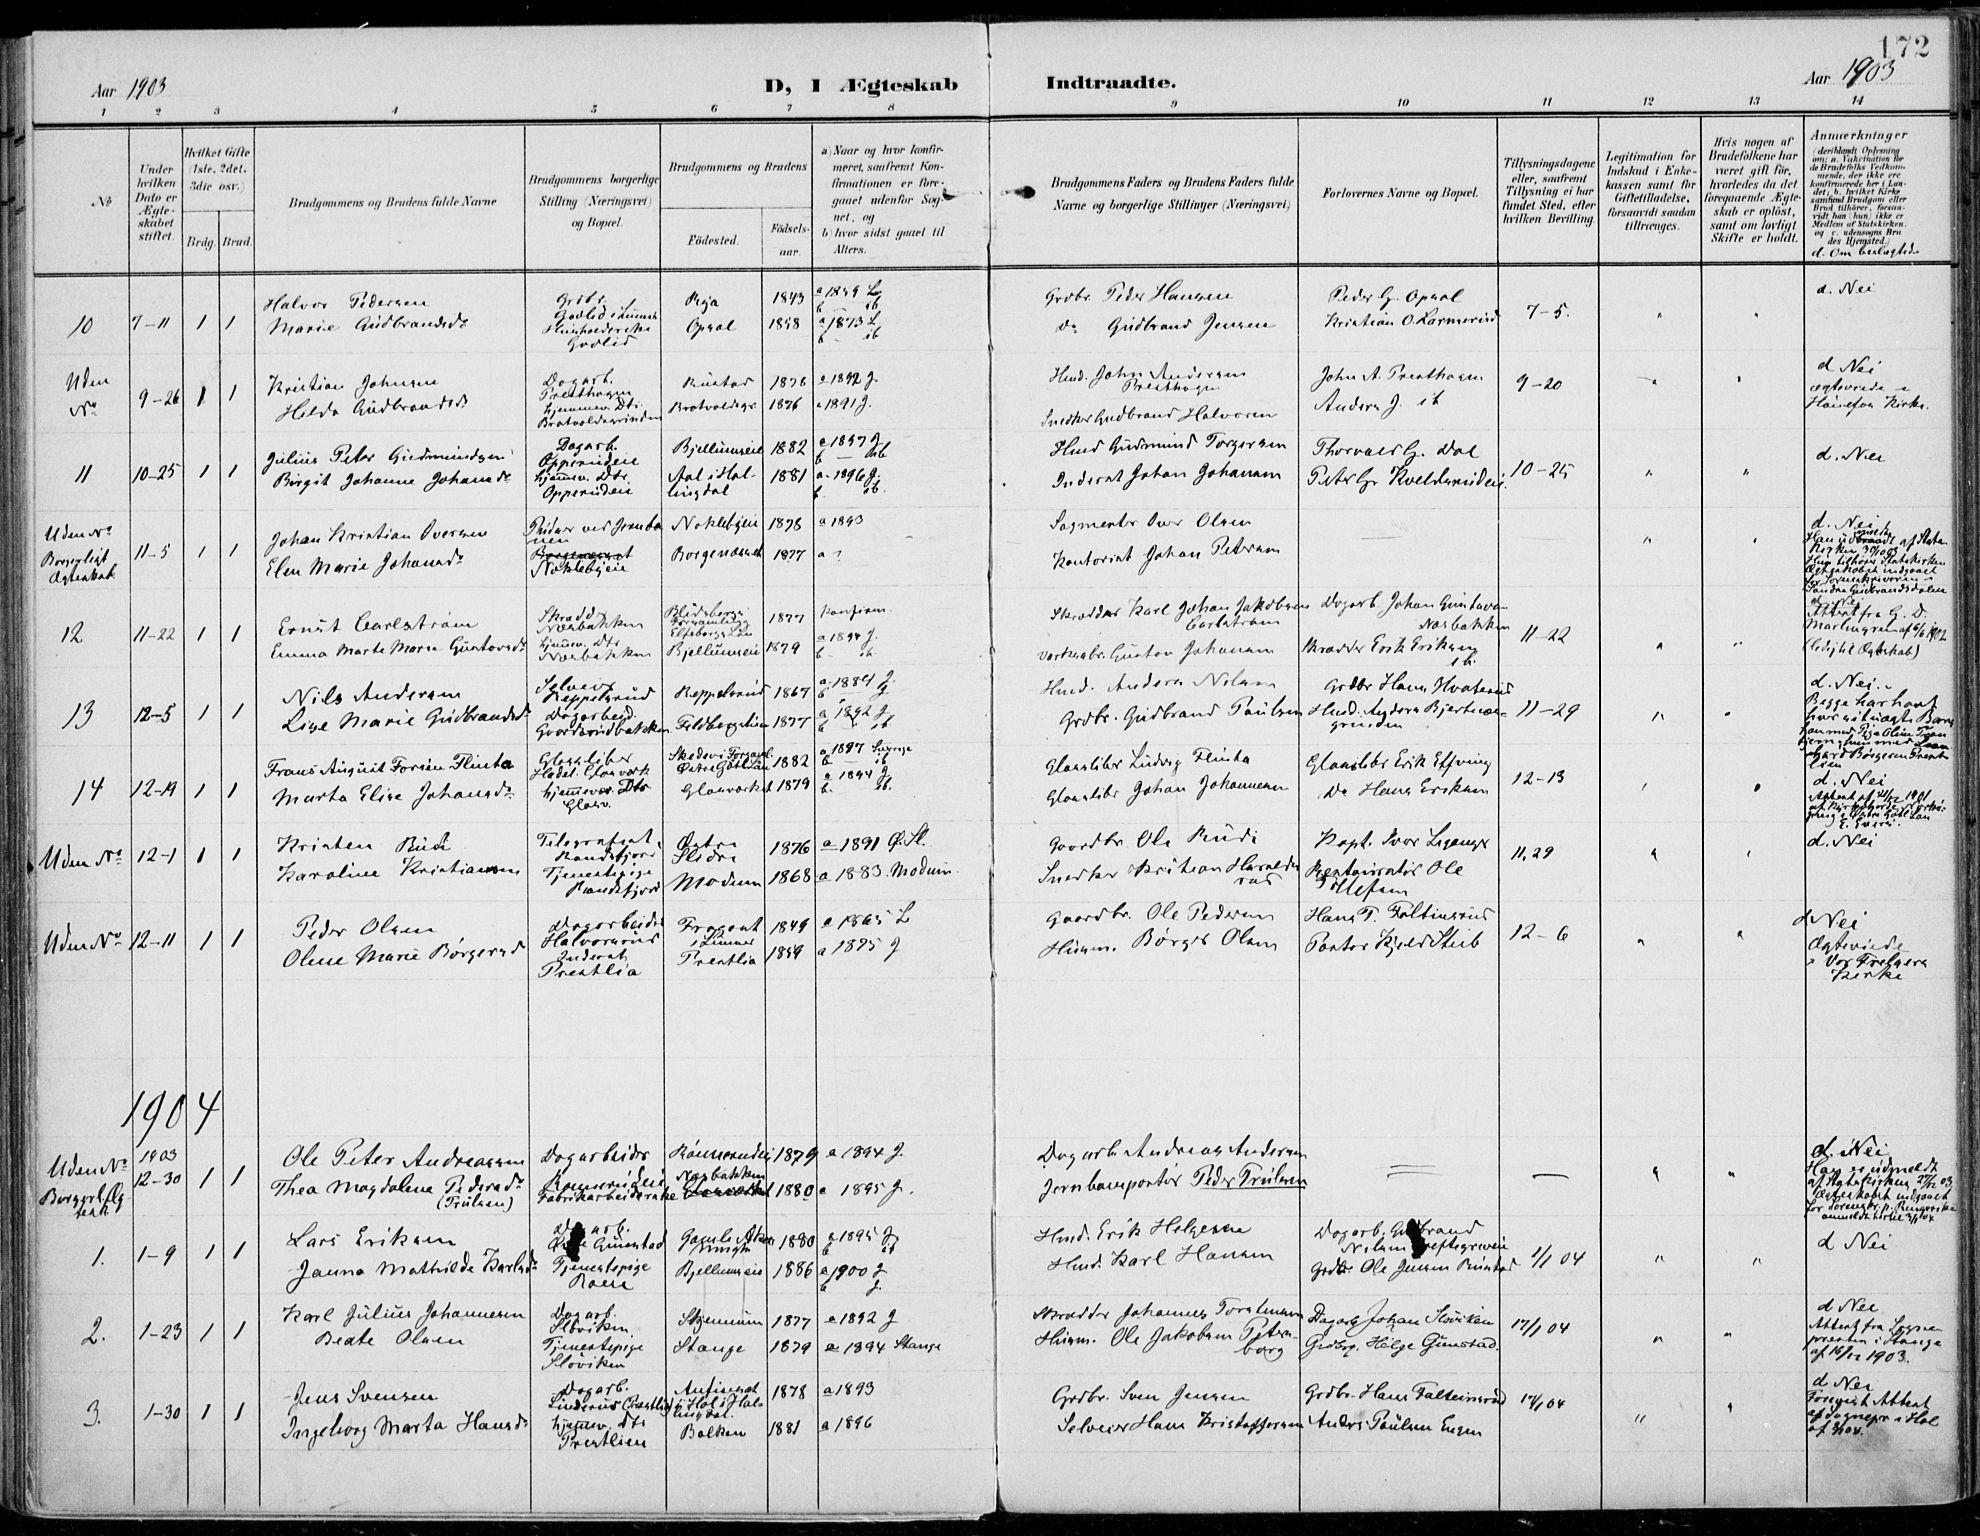 SAH, Jevnaker prestekontor, Ministerialbok nr. 11, 1902-1913, s. 172